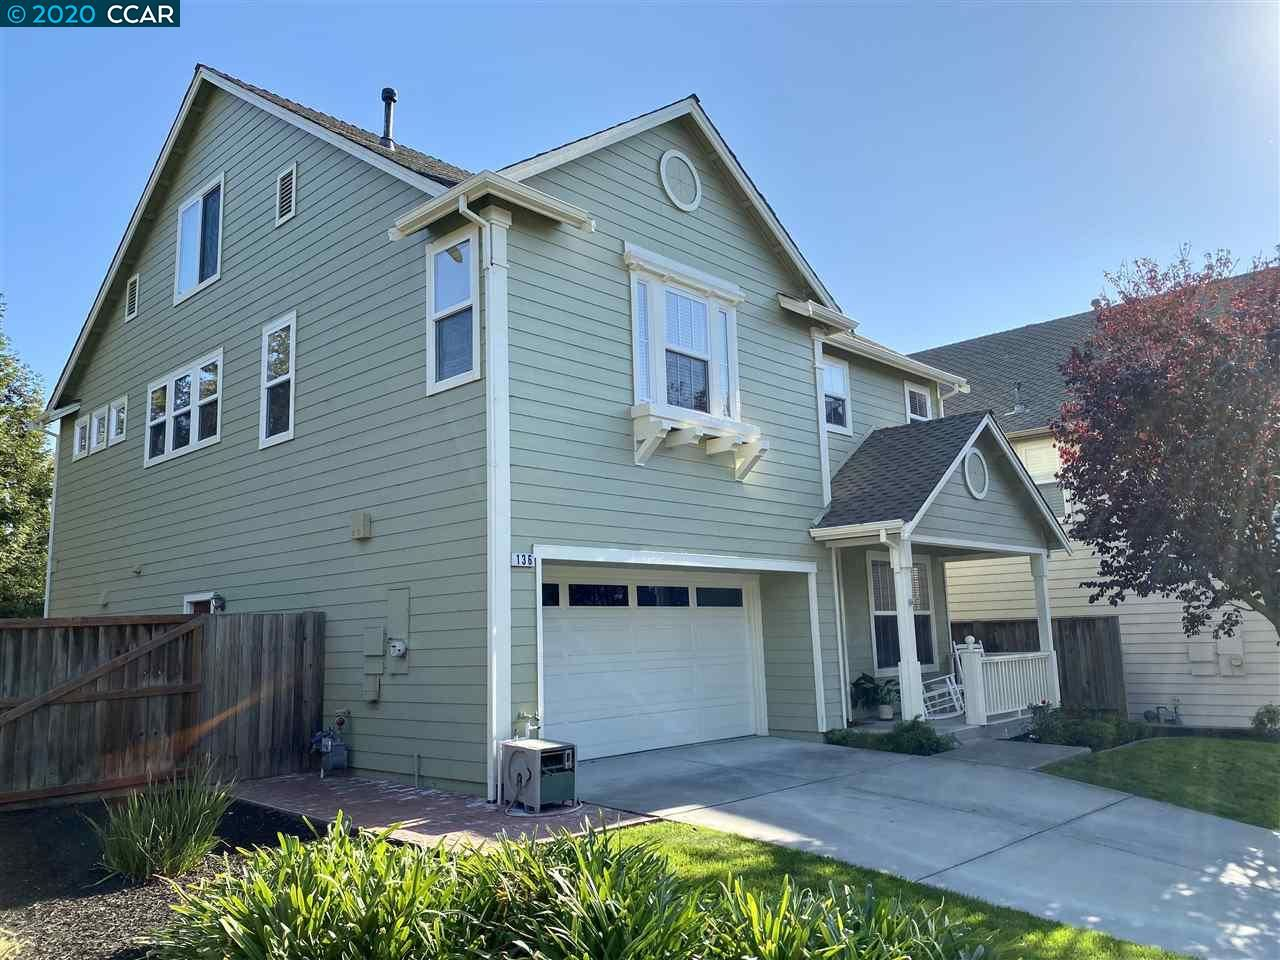 Photo for 136 Camden Ln, HERCULES, CA 94547 (MLS # 40925884)